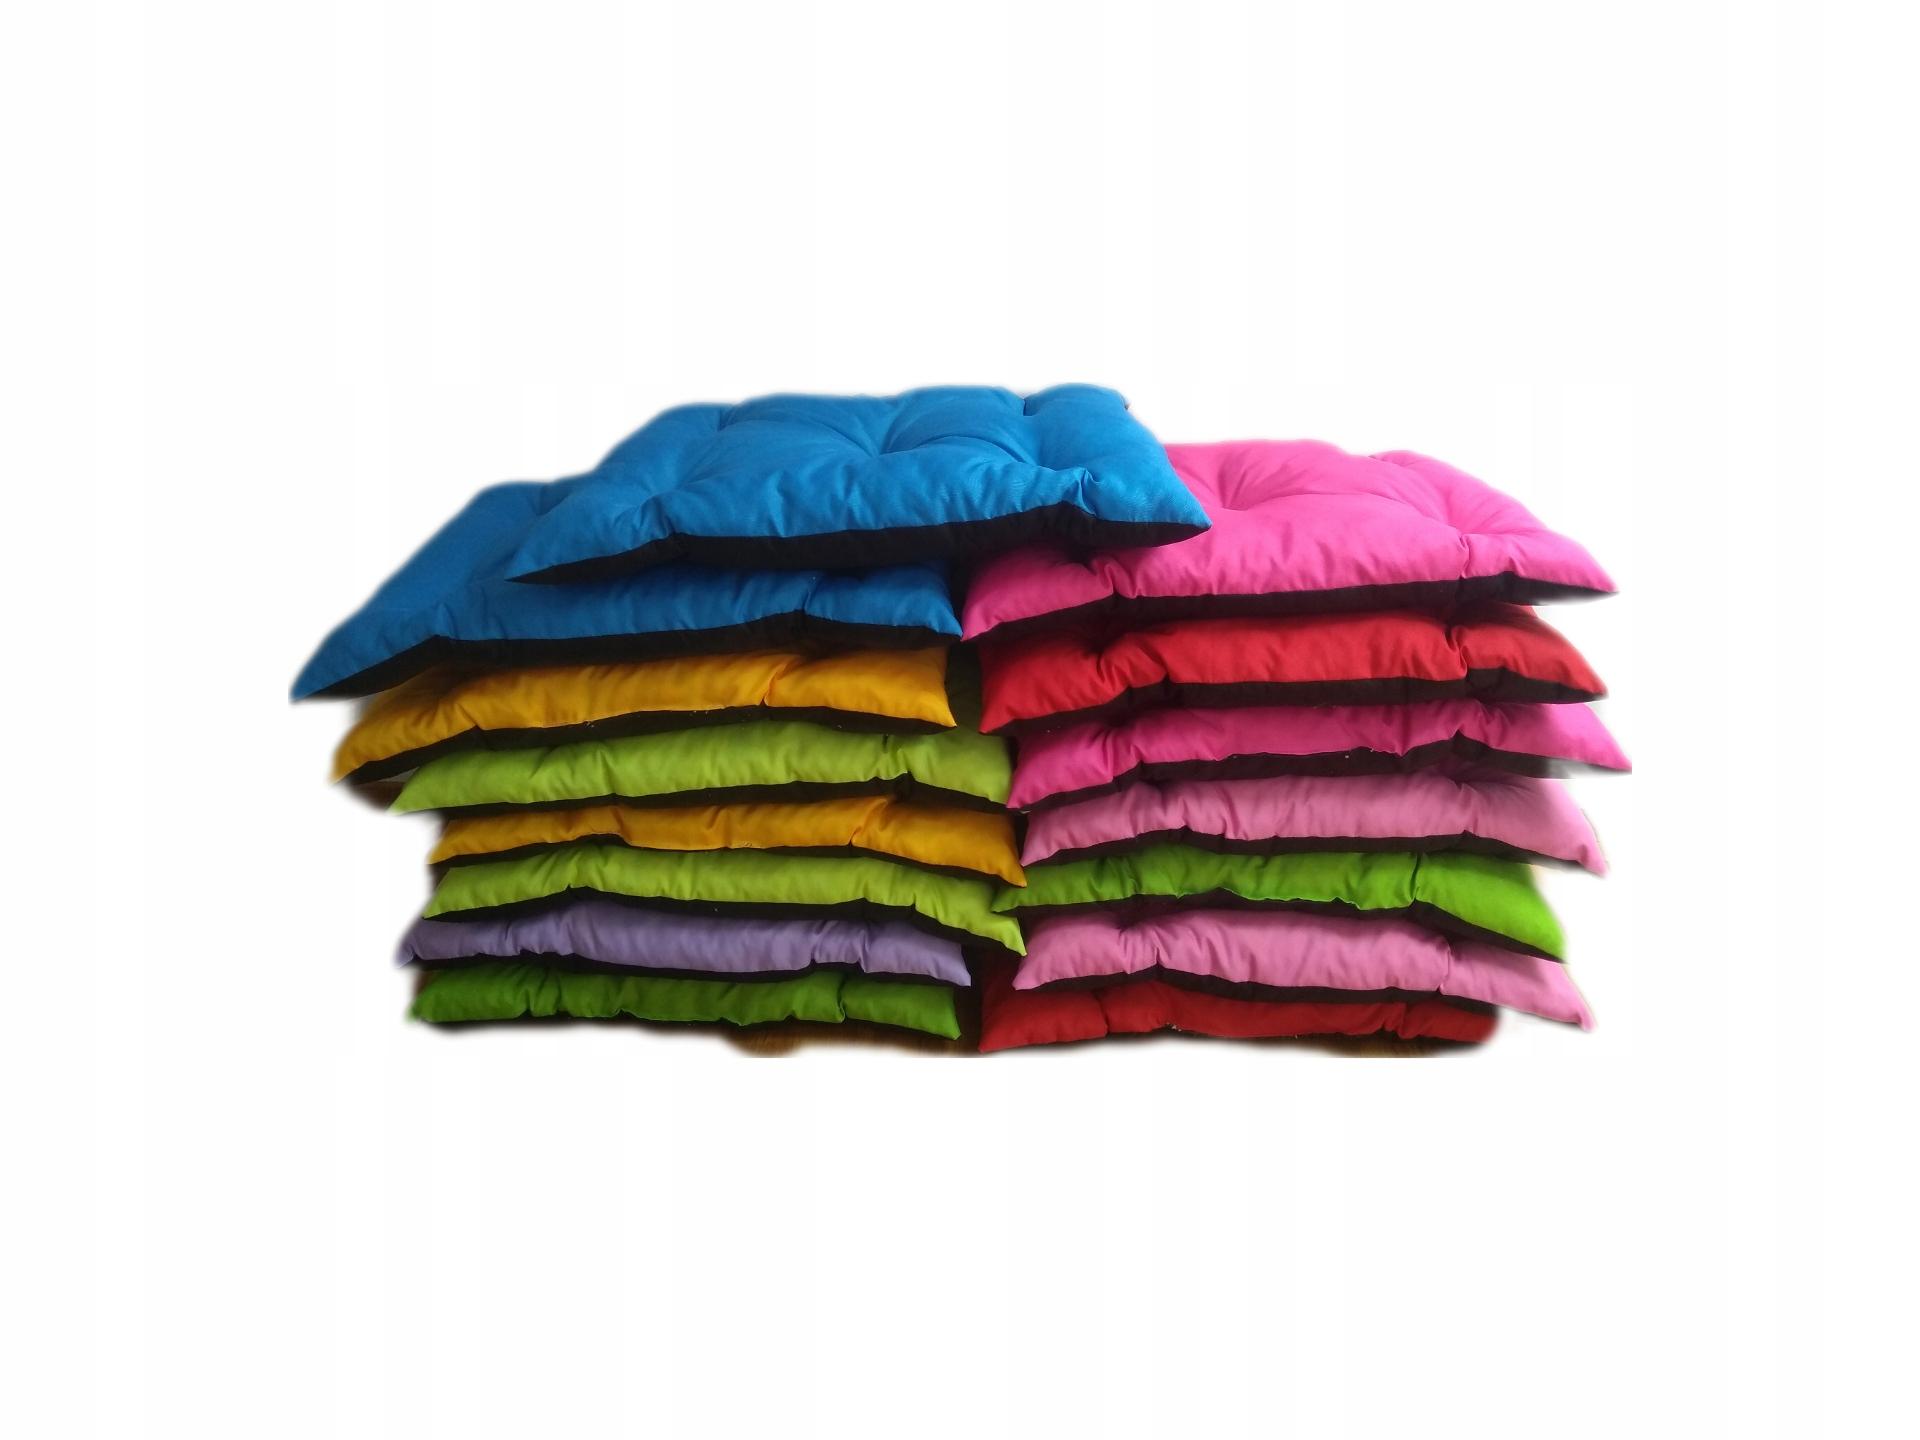 Подушка для собаки / кошки 60х80 + ИМЯ БЕСПЛАТНО